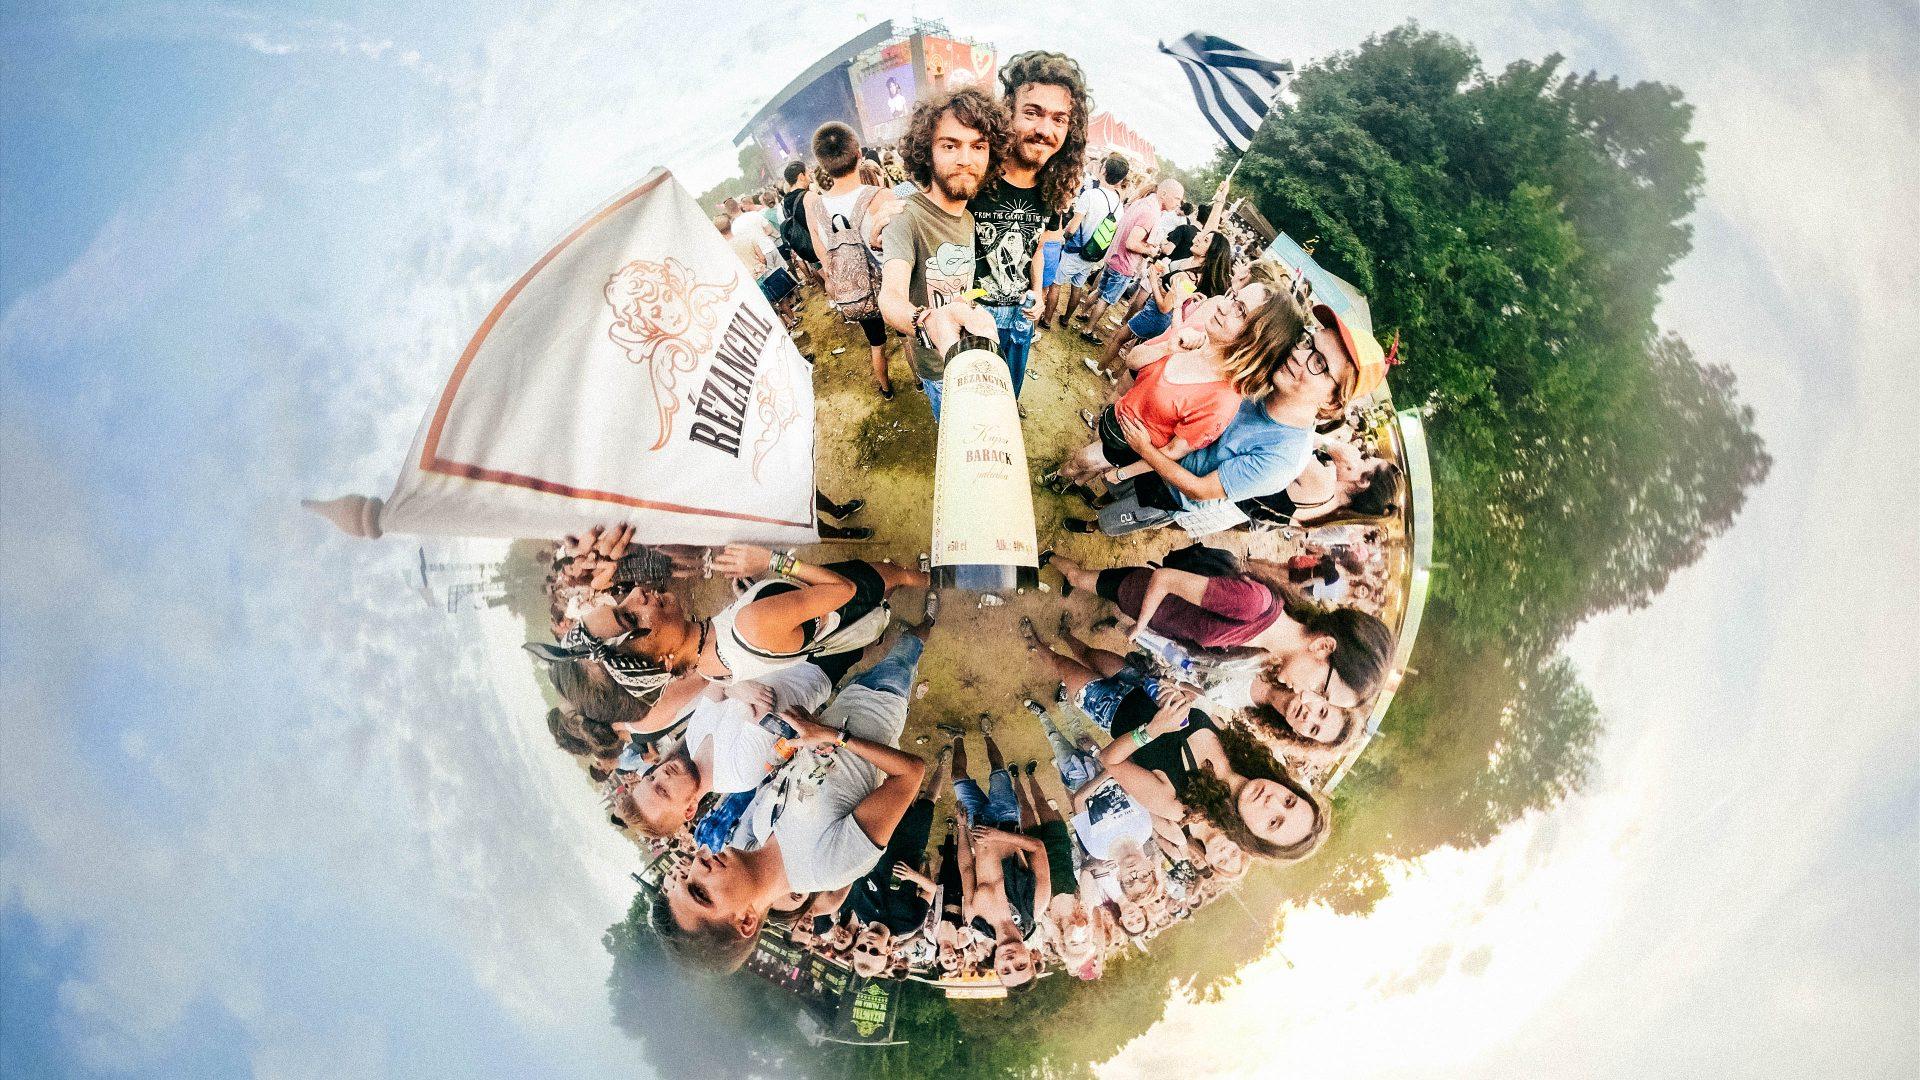 Tiny World of Rézangyal – The best festival campaign by HEYTHERE agencyTiny World of Rézangyal – The best festival campaign by HEYTHERE agency